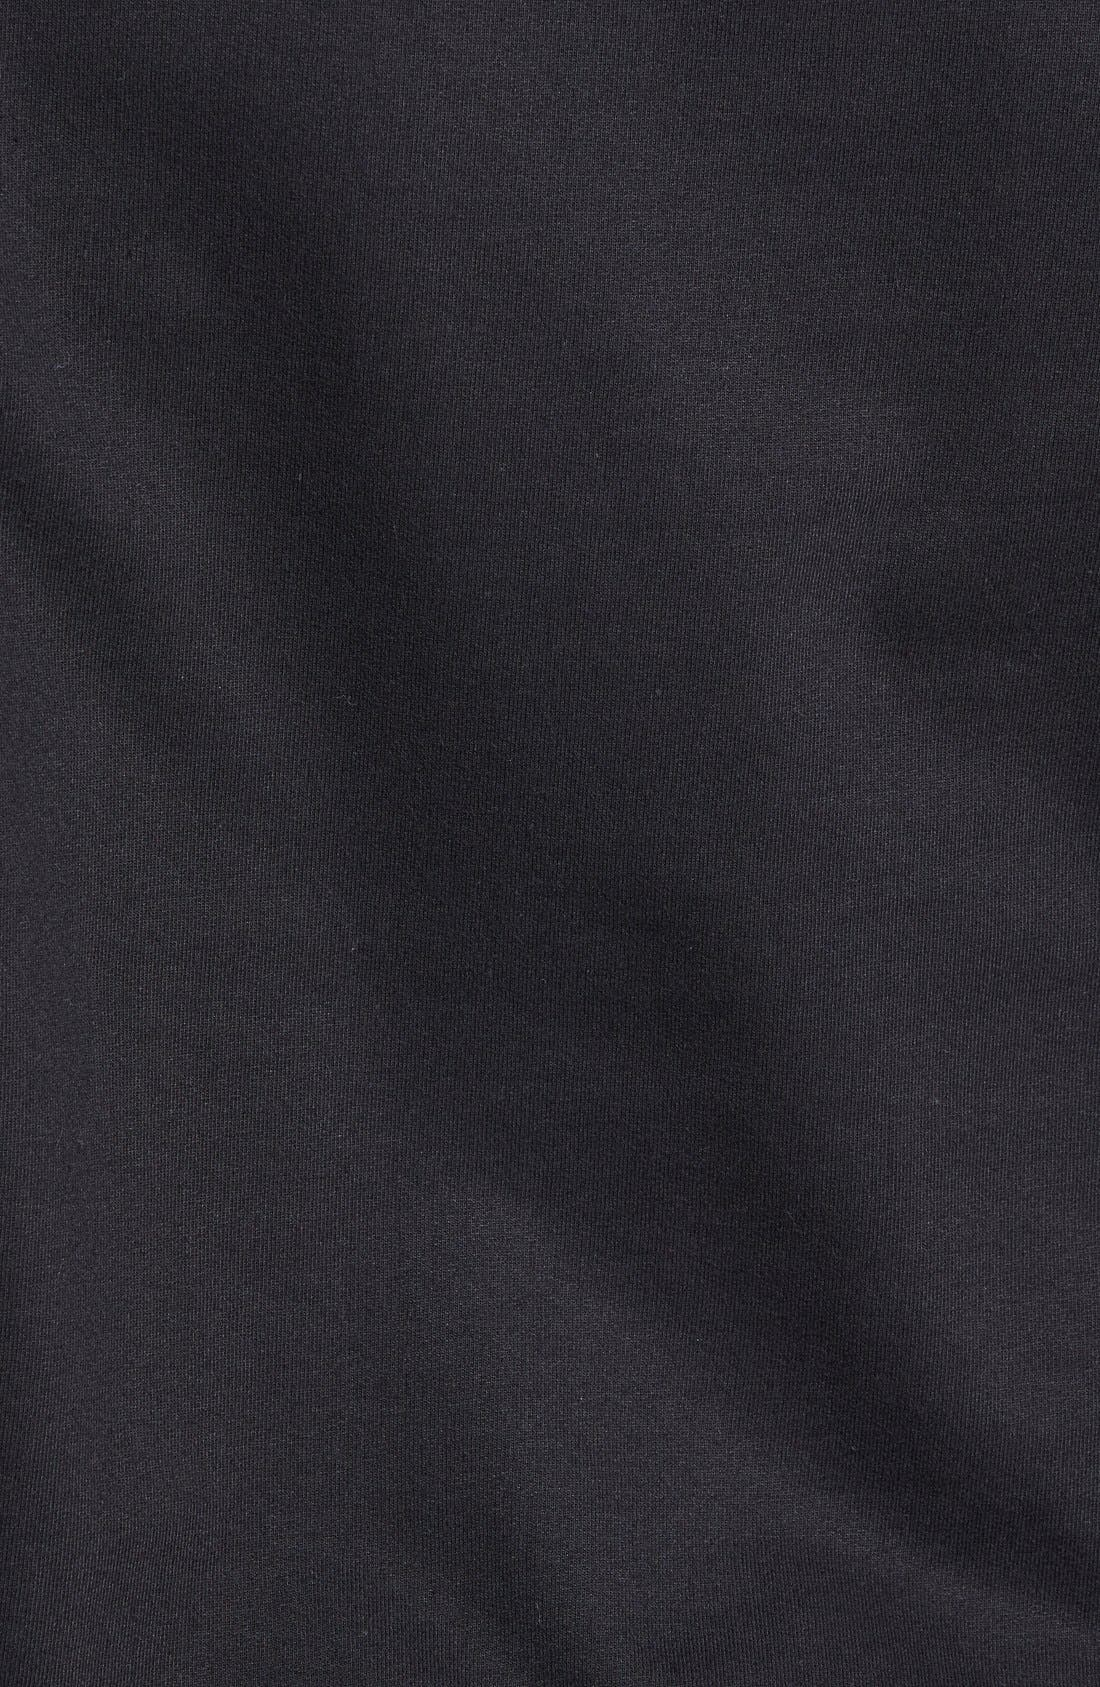 Alternate Image 3  - ELEVENPARIS 'Life Is a Joke' Pullover Sweatshirt